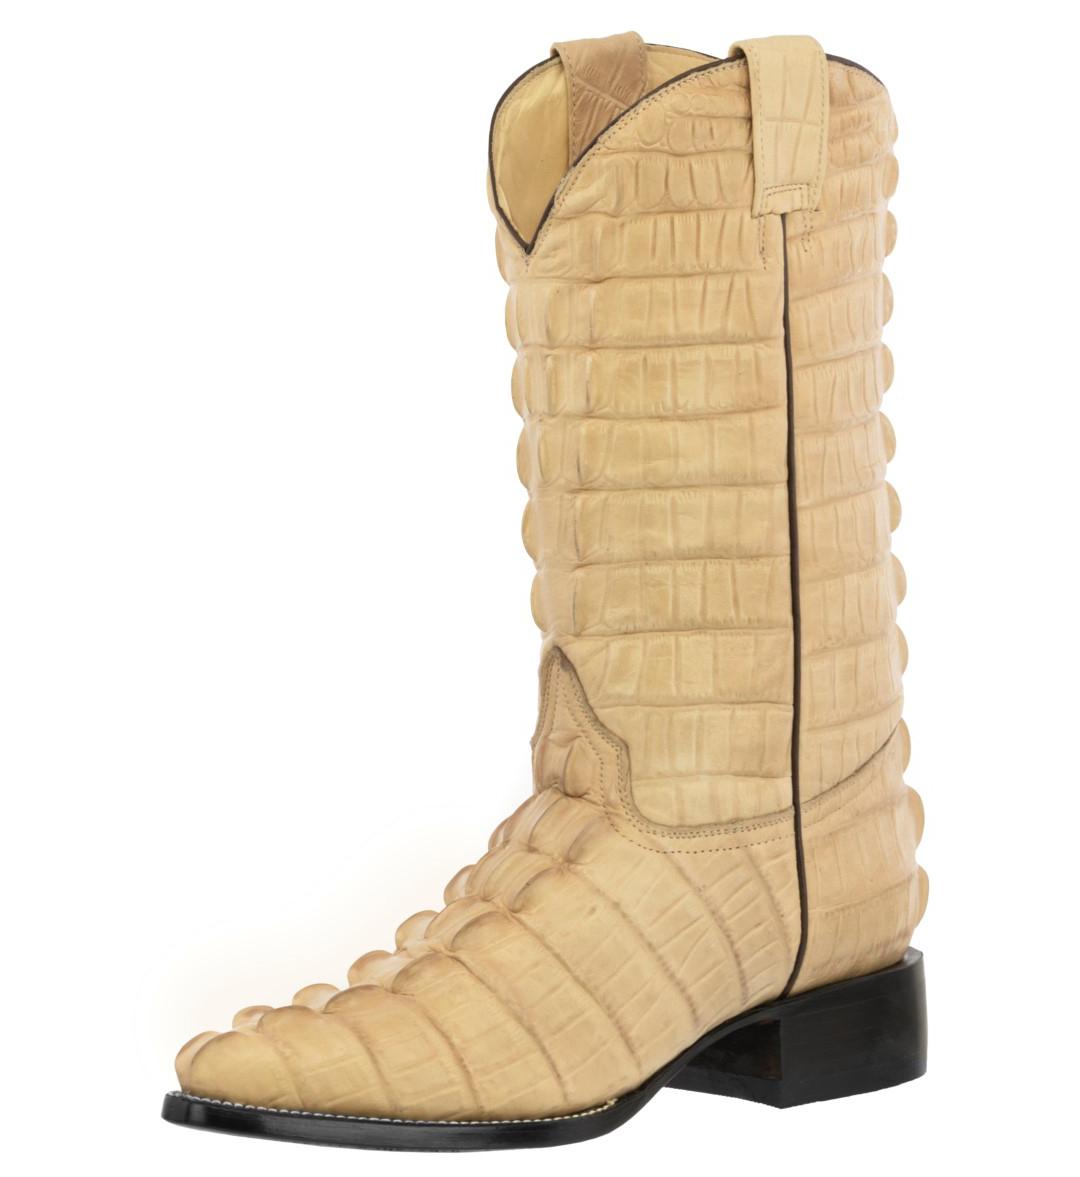 8cb169117a7 Mens Sand Full Alligator Print Leather Cowboy Boots Western Wear ...